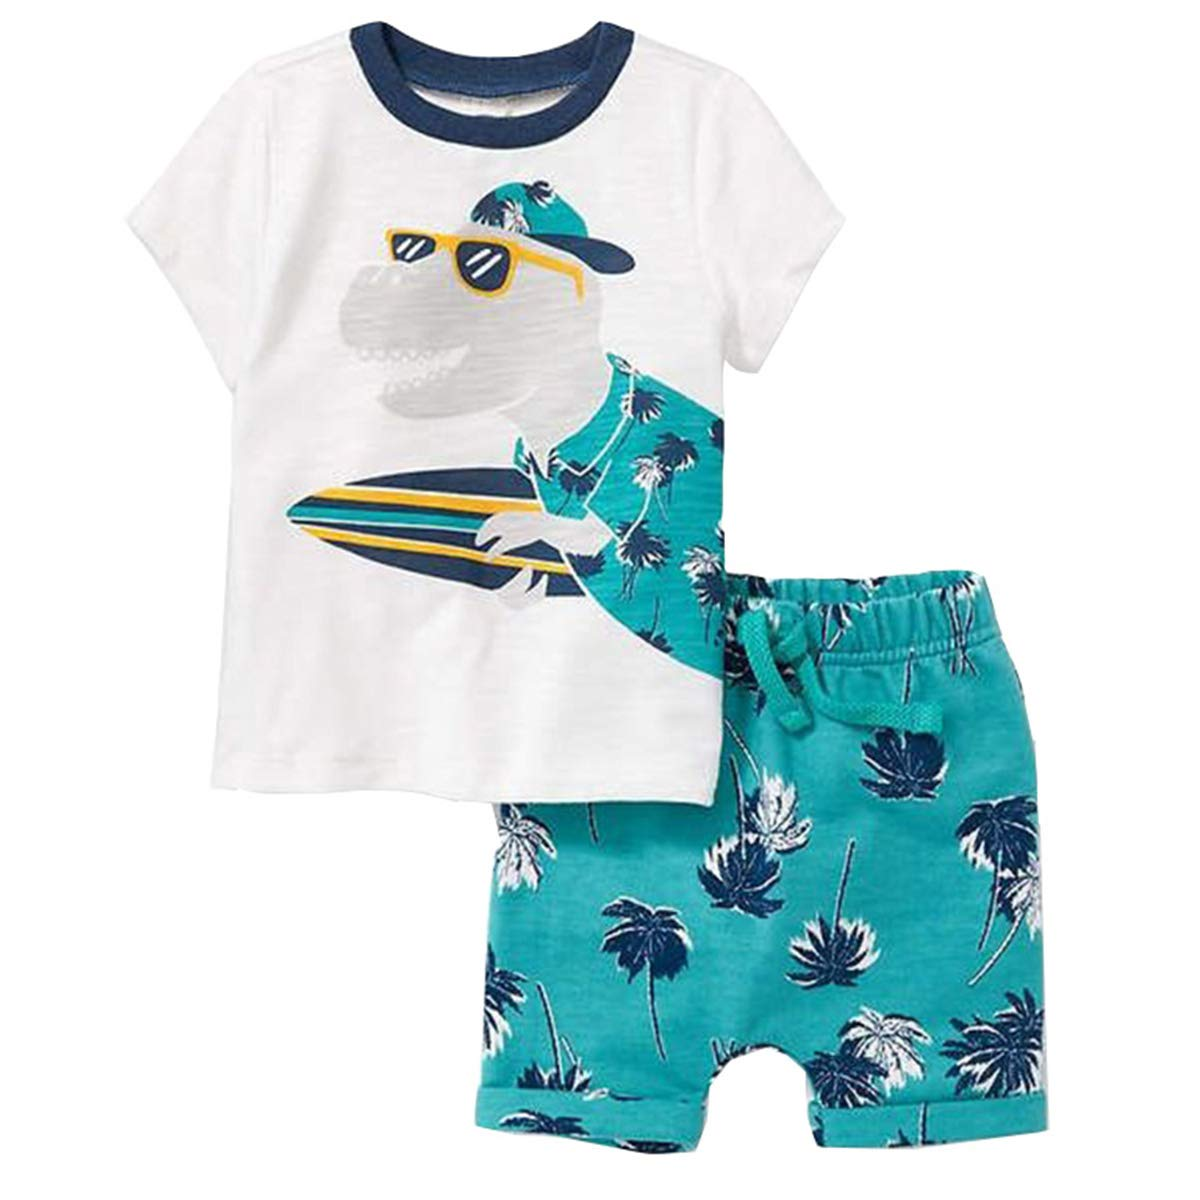 Boys Clothes Set Summer Cotton T-Shirt and Shorts 2 Pieces 2T-7T